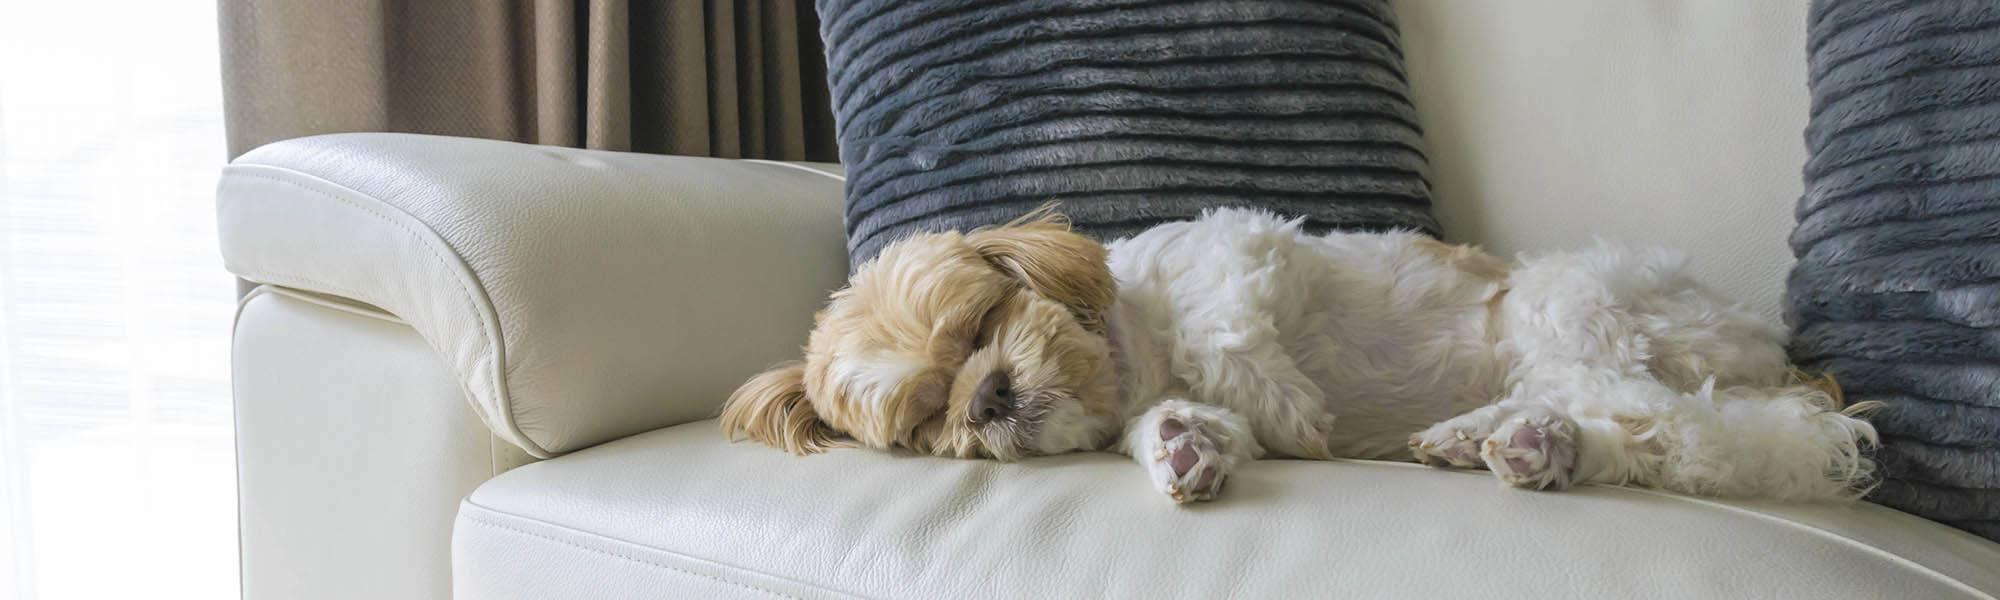 Pet friendly apartments in Warrenton